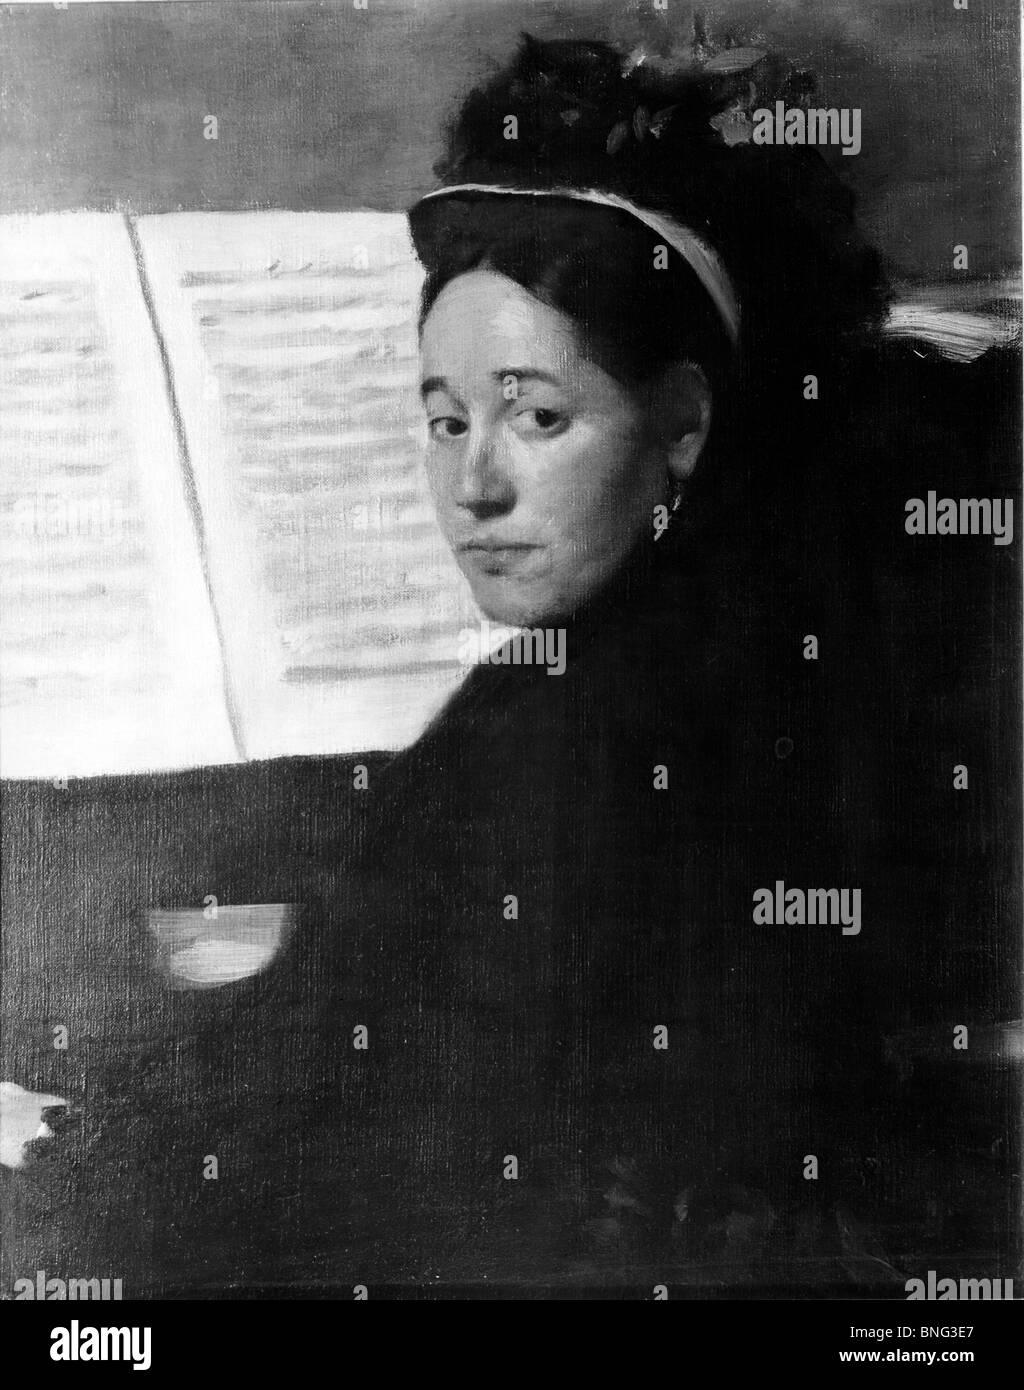 Miss Dihan at the Piano by Edgar Degas, 1834-1917 - Stock Image